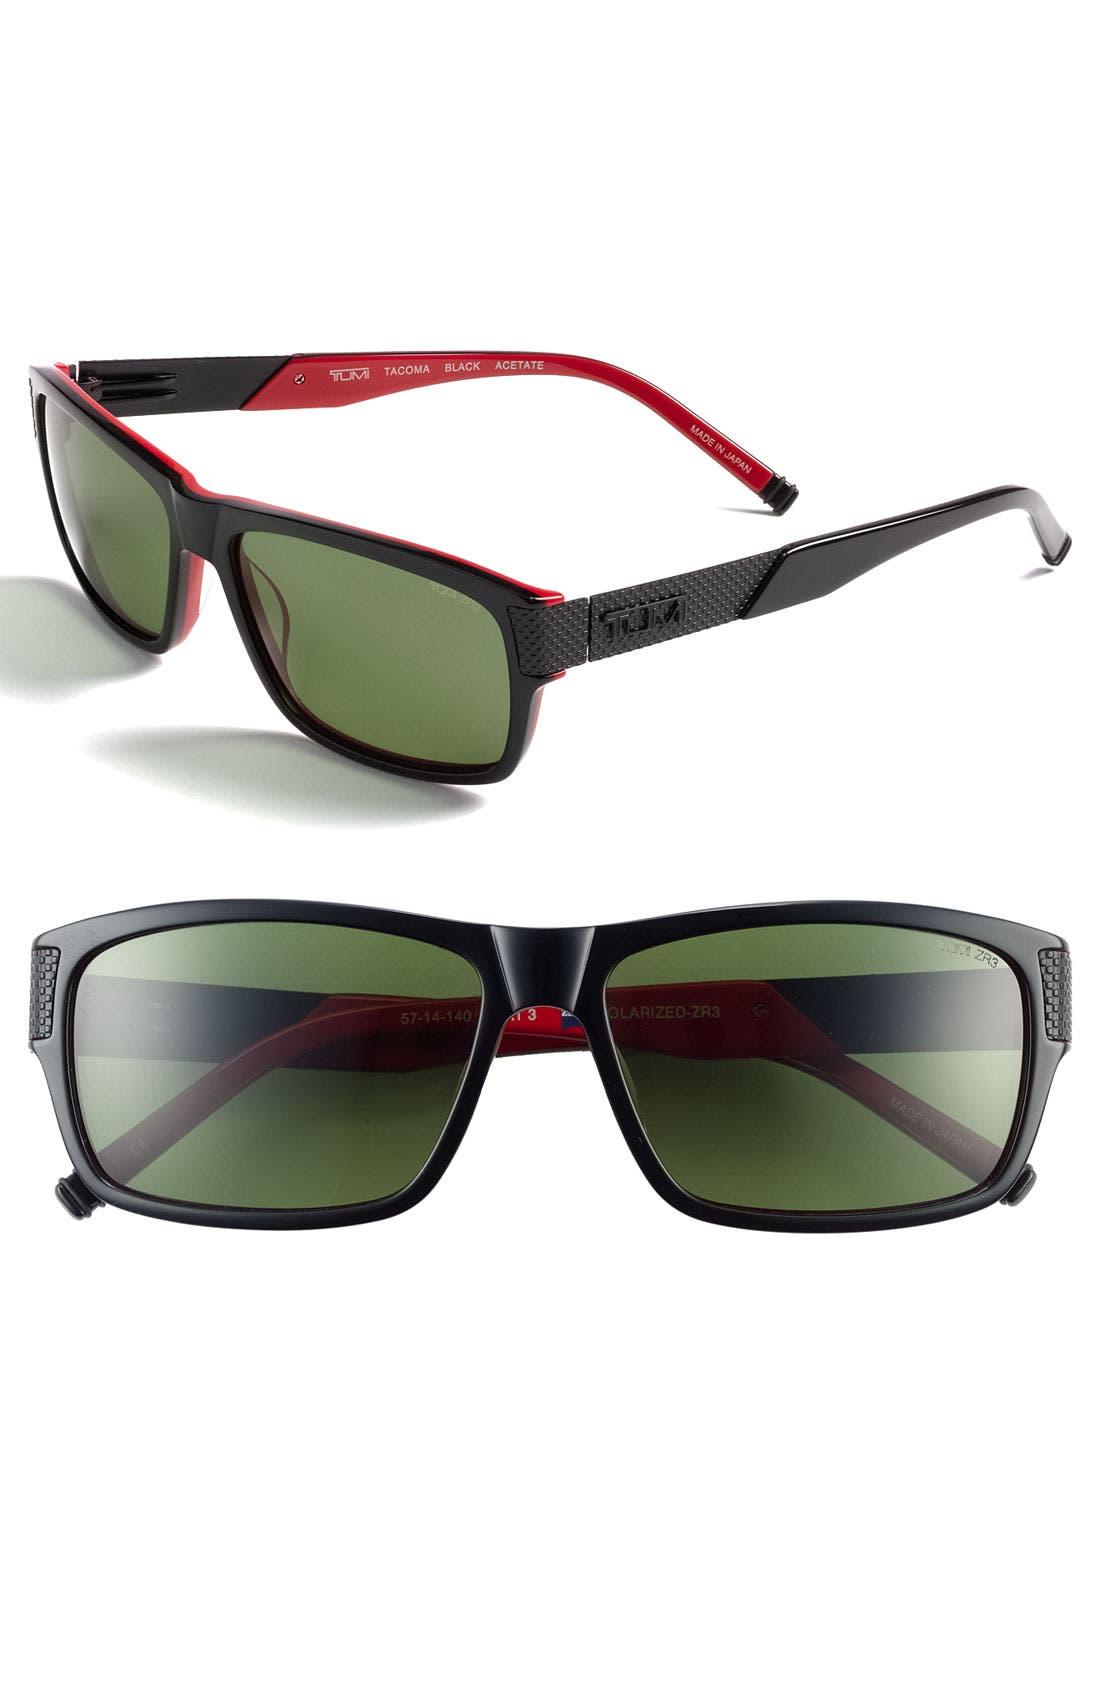 Alternate Image 1 Selected - Tumi 'Tacoma' Polarized Sunglasses